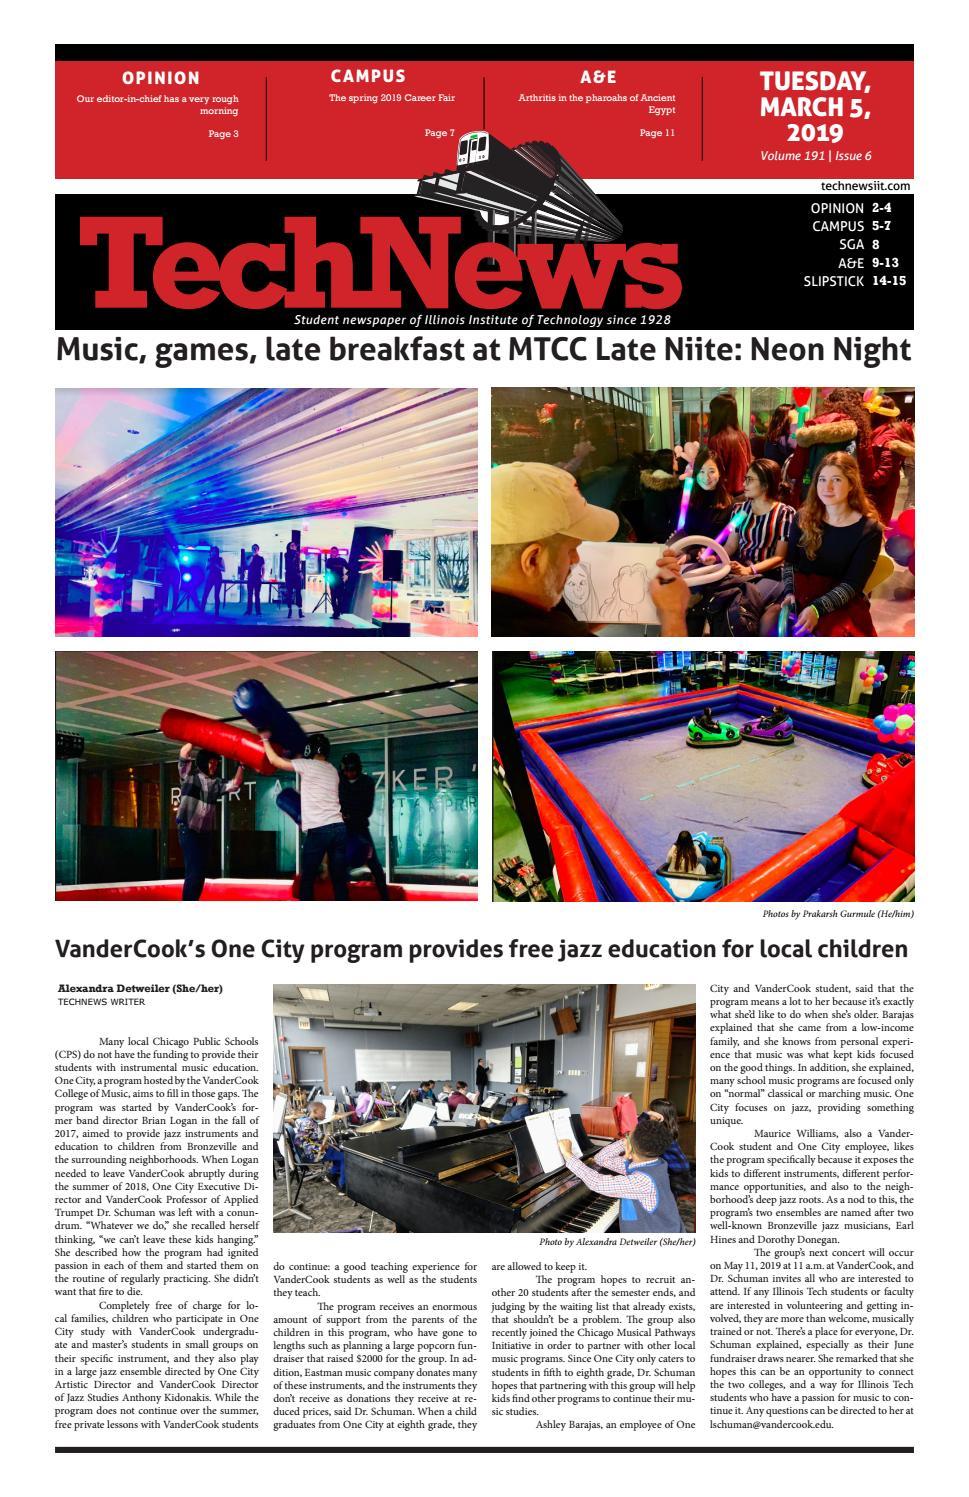 Volume 191 Issue 6 by TechNews - issuu